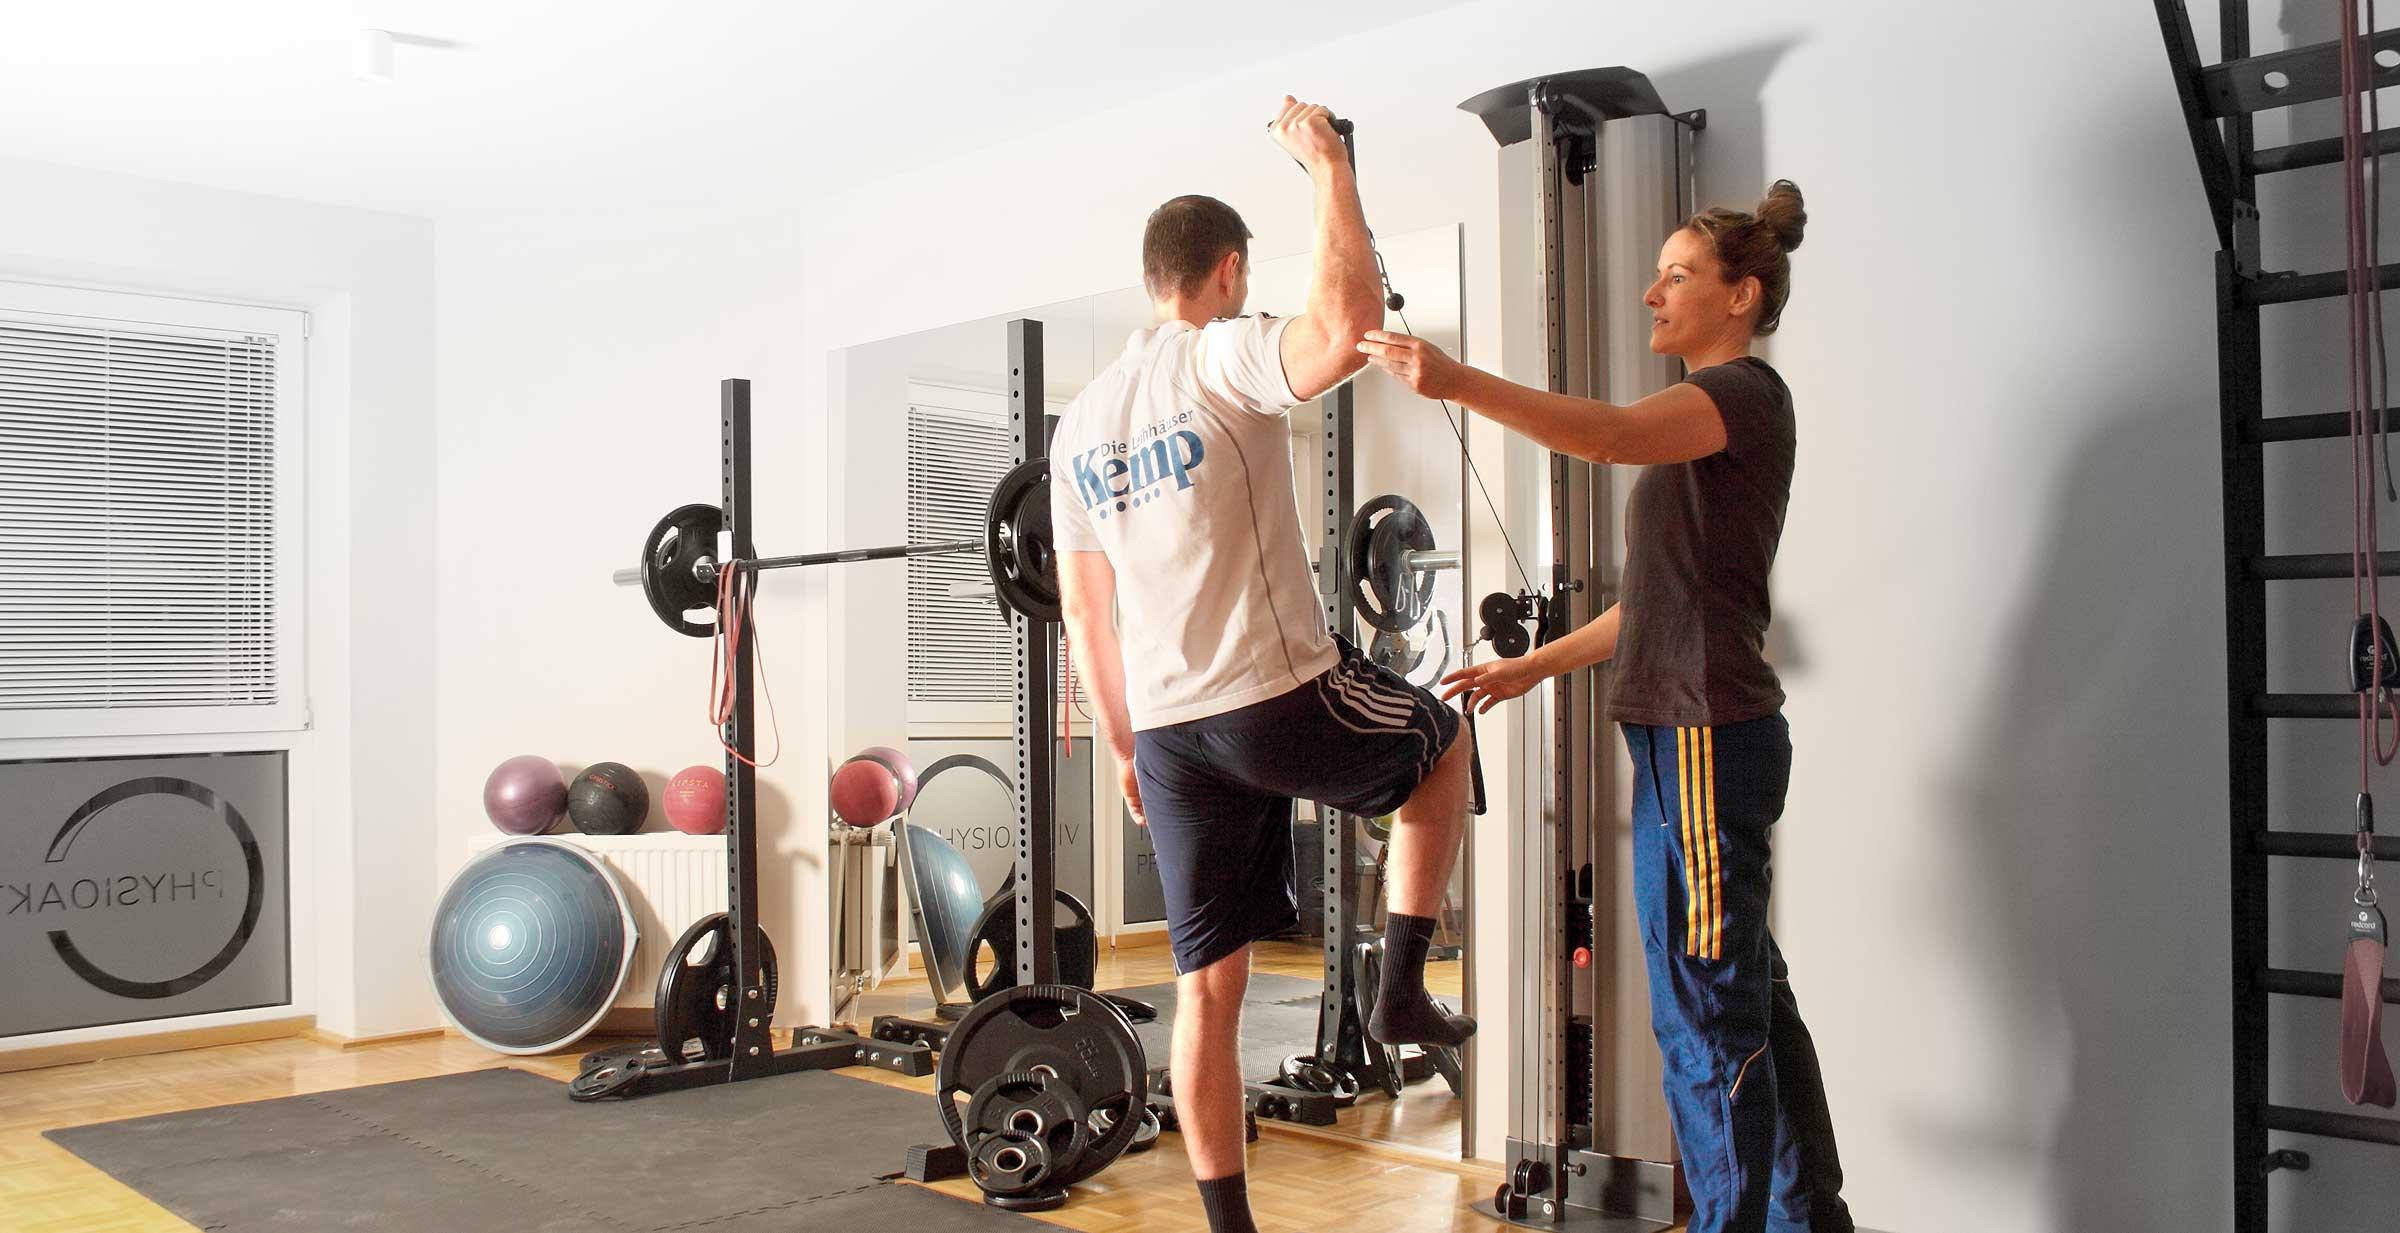 PhysioAktiv: Manuelle Therapie, Krankengymnastik und Kinesiotaping